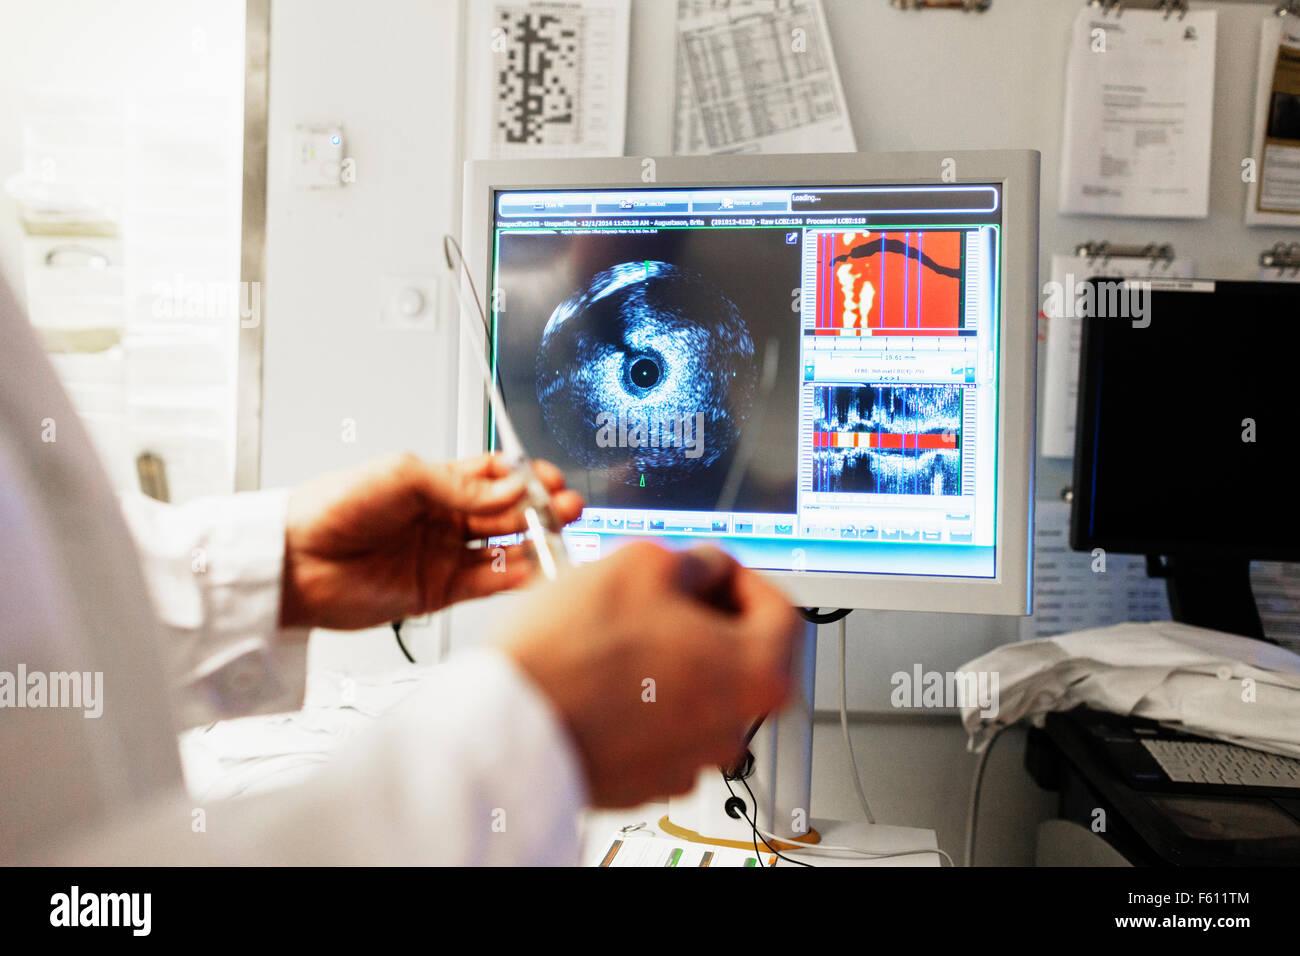 Arzt Holding Katheter vor intravaskulären imaging-system Stockbild